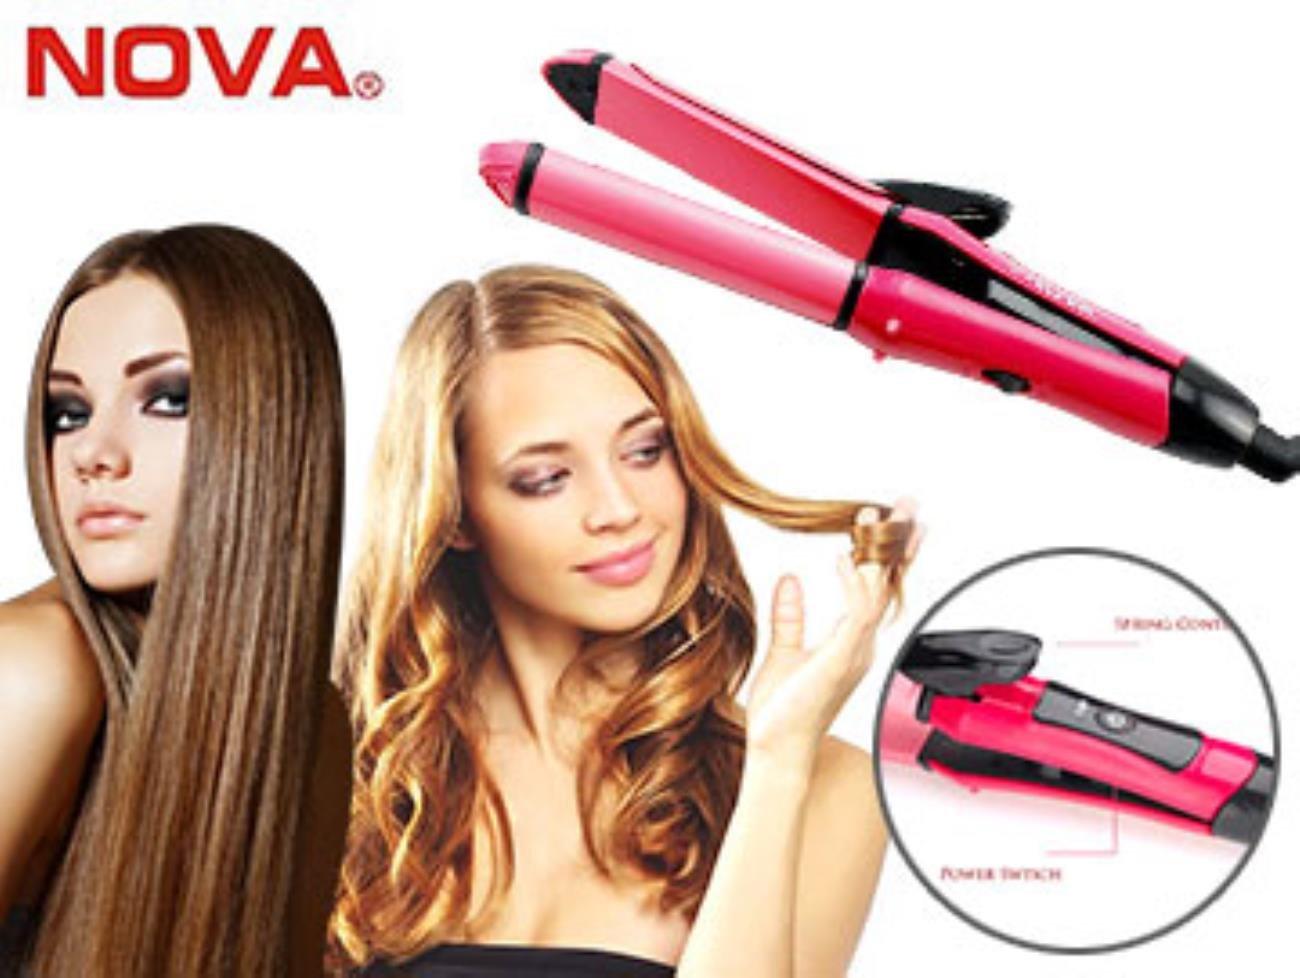 Image result for nova hair straightener and curler